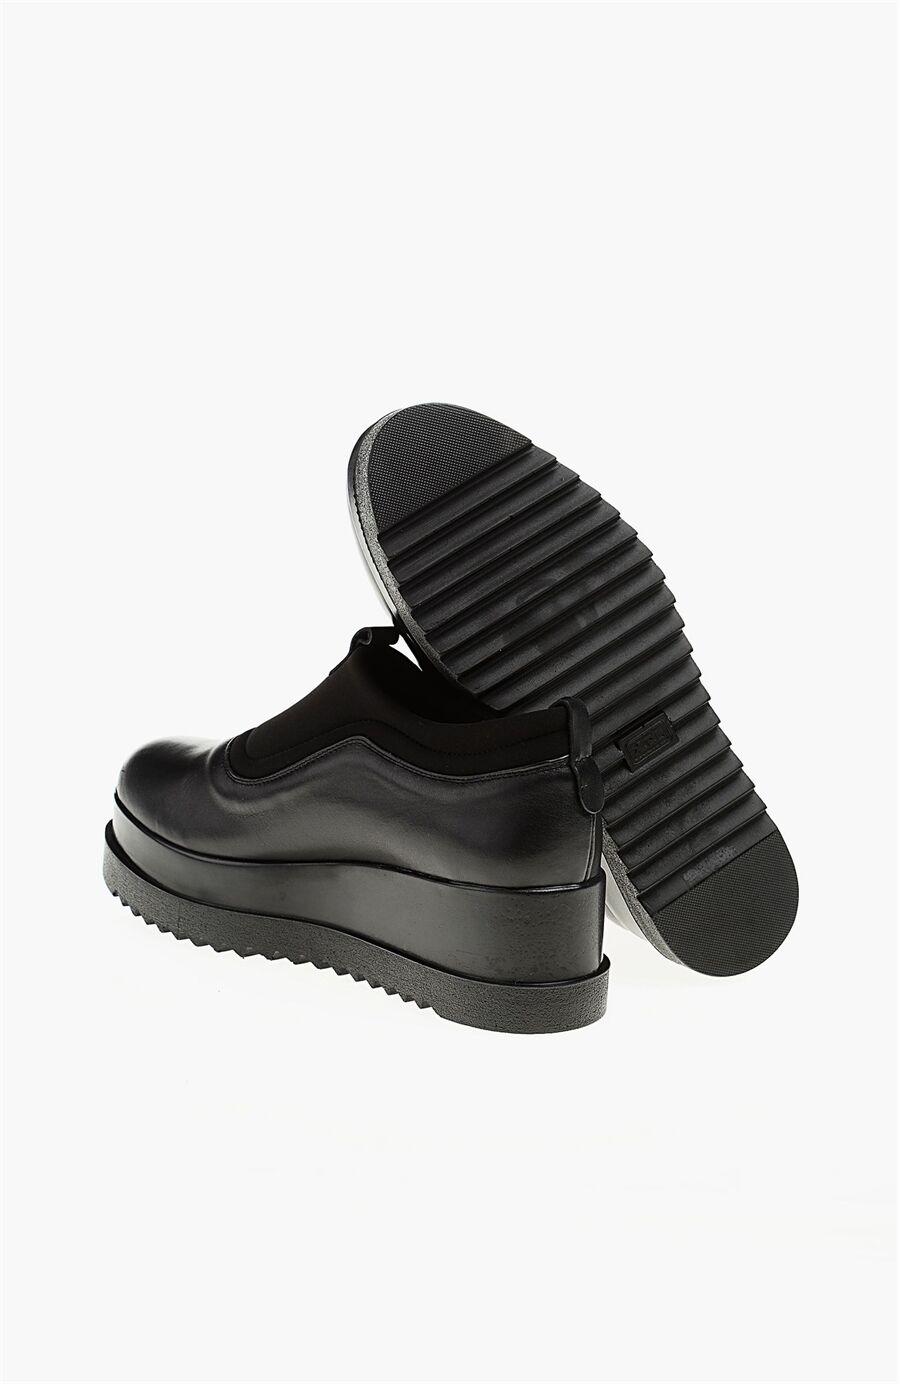 Platformlu Deri Siyah Ayakkabı